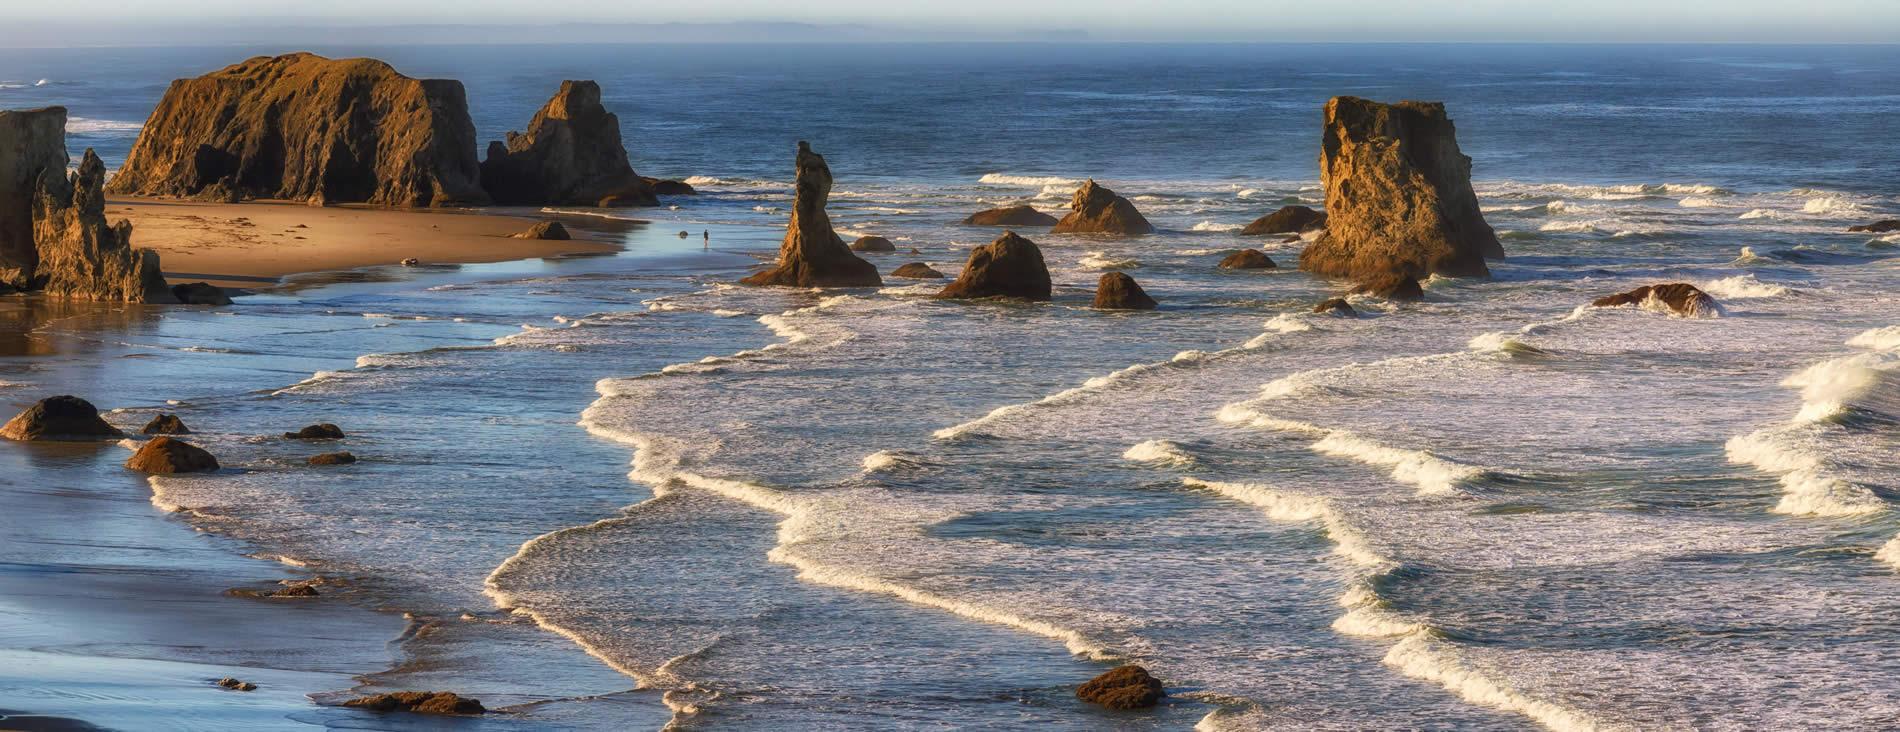 bandon maria inn - ocean scene